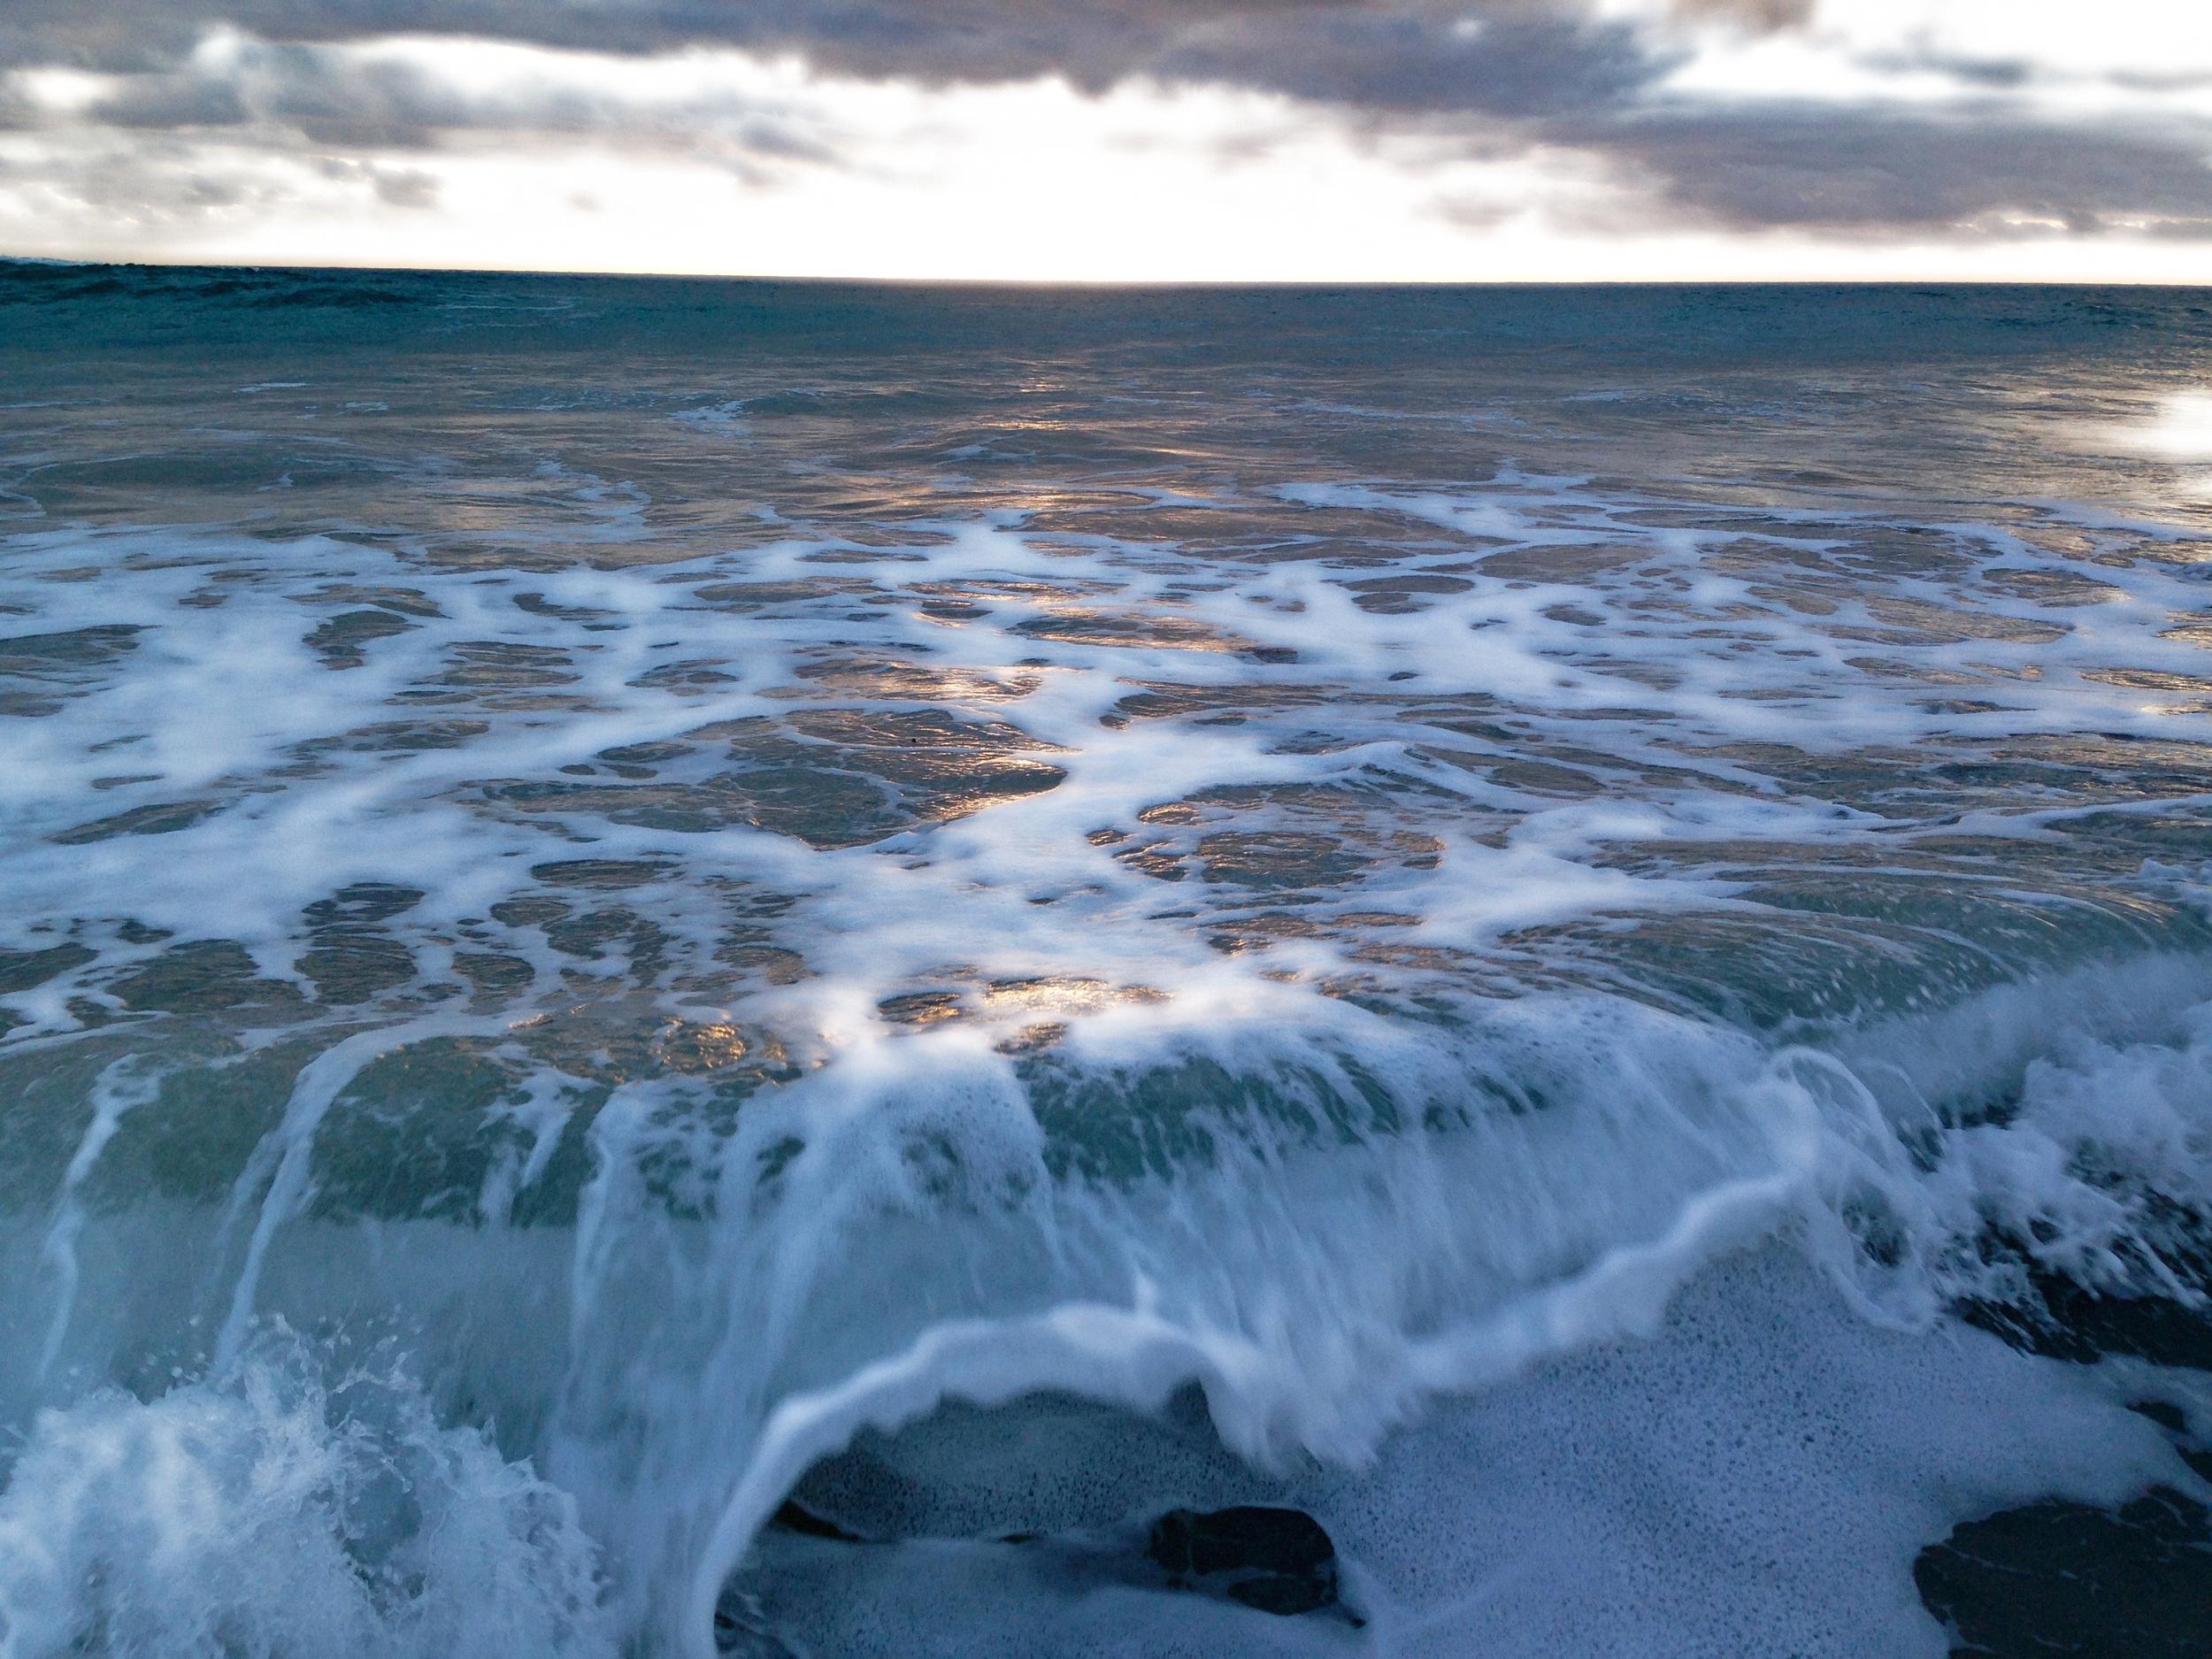 Indian Ocean  Doddies Beach, Mandurah, Western Australia VHS 2015, posted June 12, wk 51